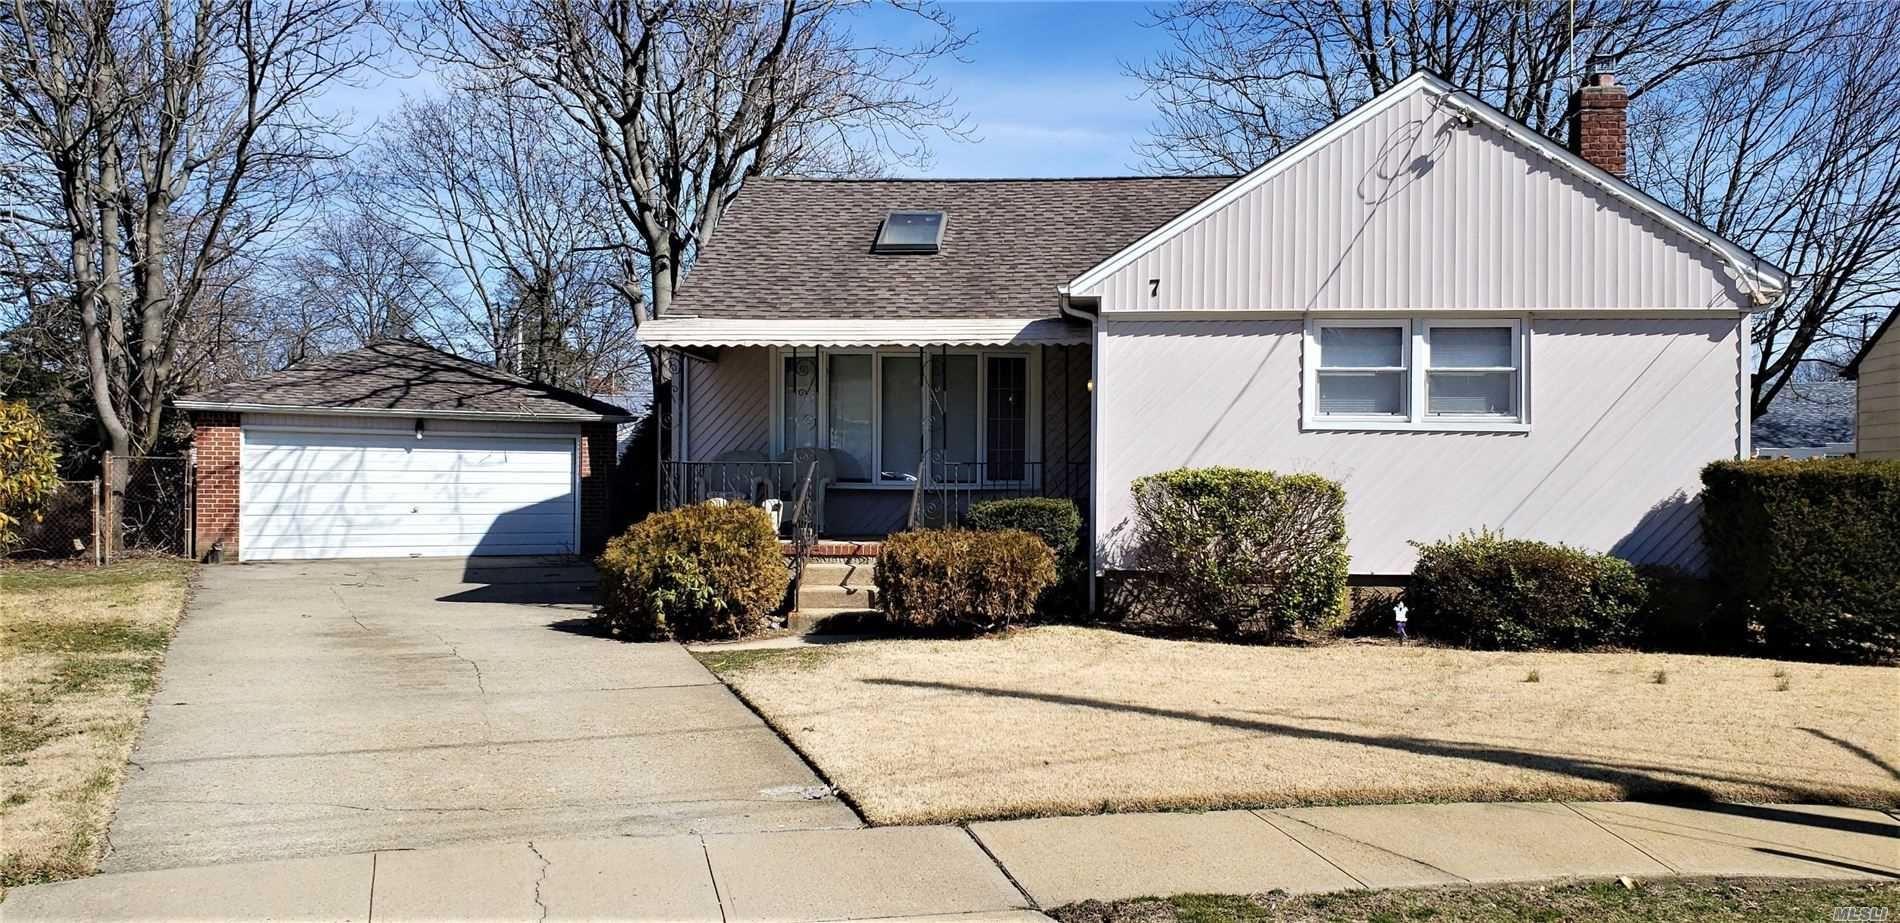 7 Roosevelt Street, Hempstead, NY 11550 - MLS#: 3209791